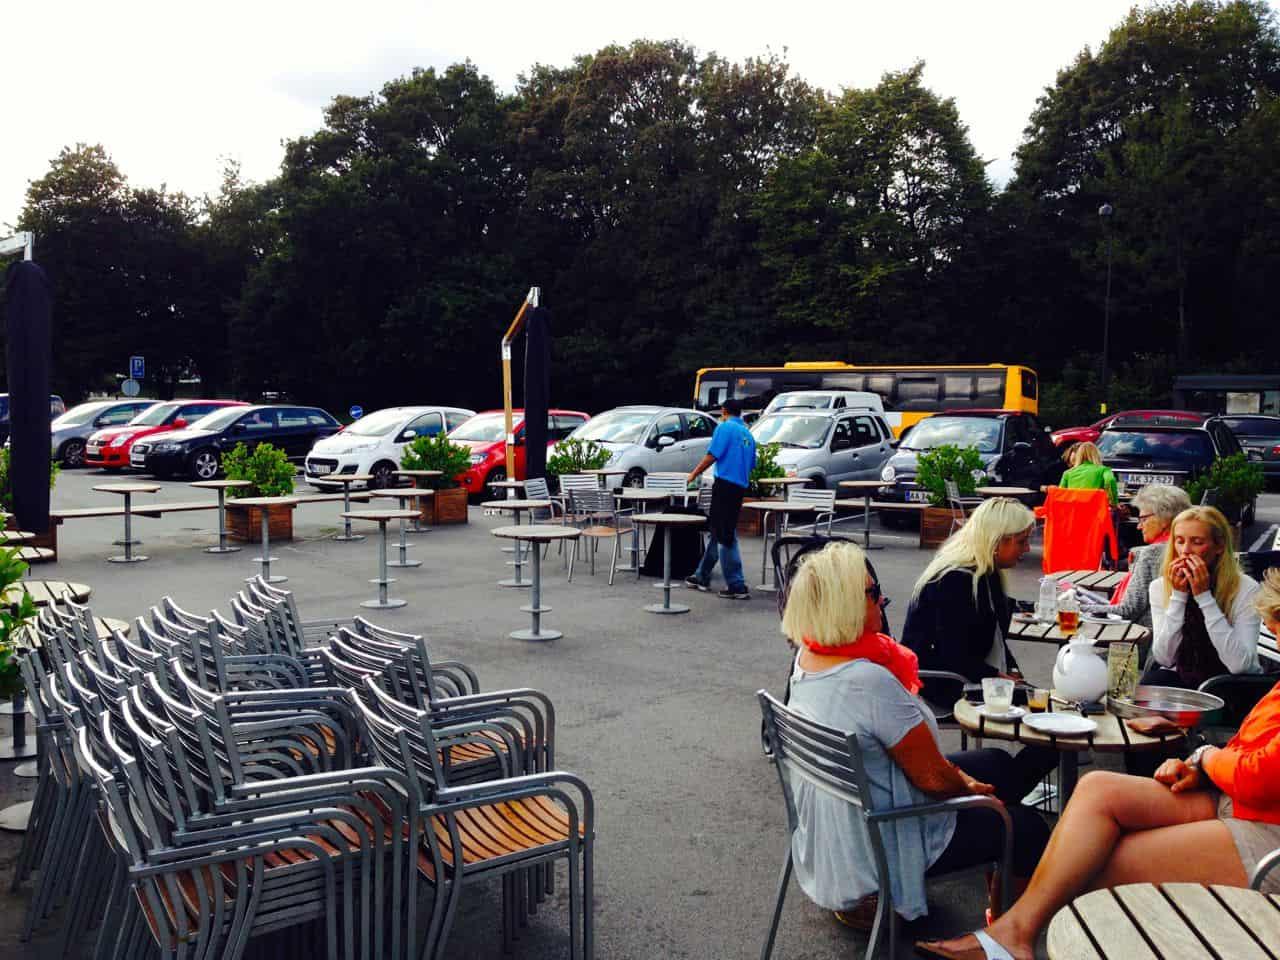 140927 Brunch på Café Jorden Rundt – Charlottenlund, Danmark 4